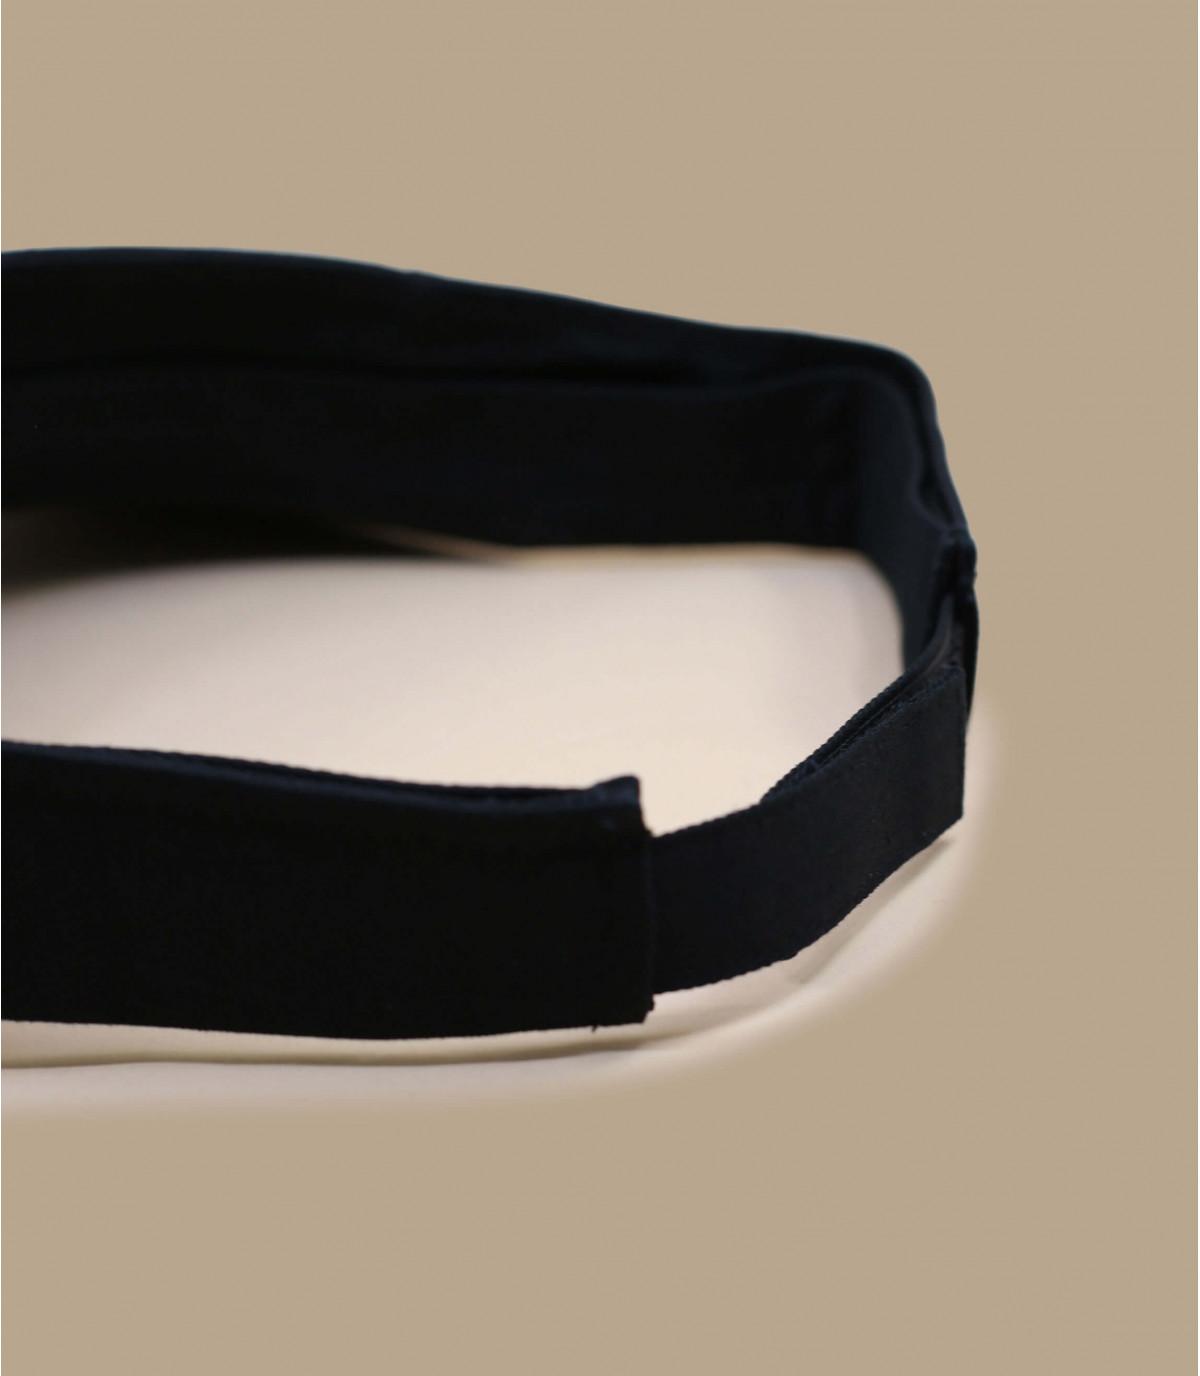 Détails Black visor - image 3